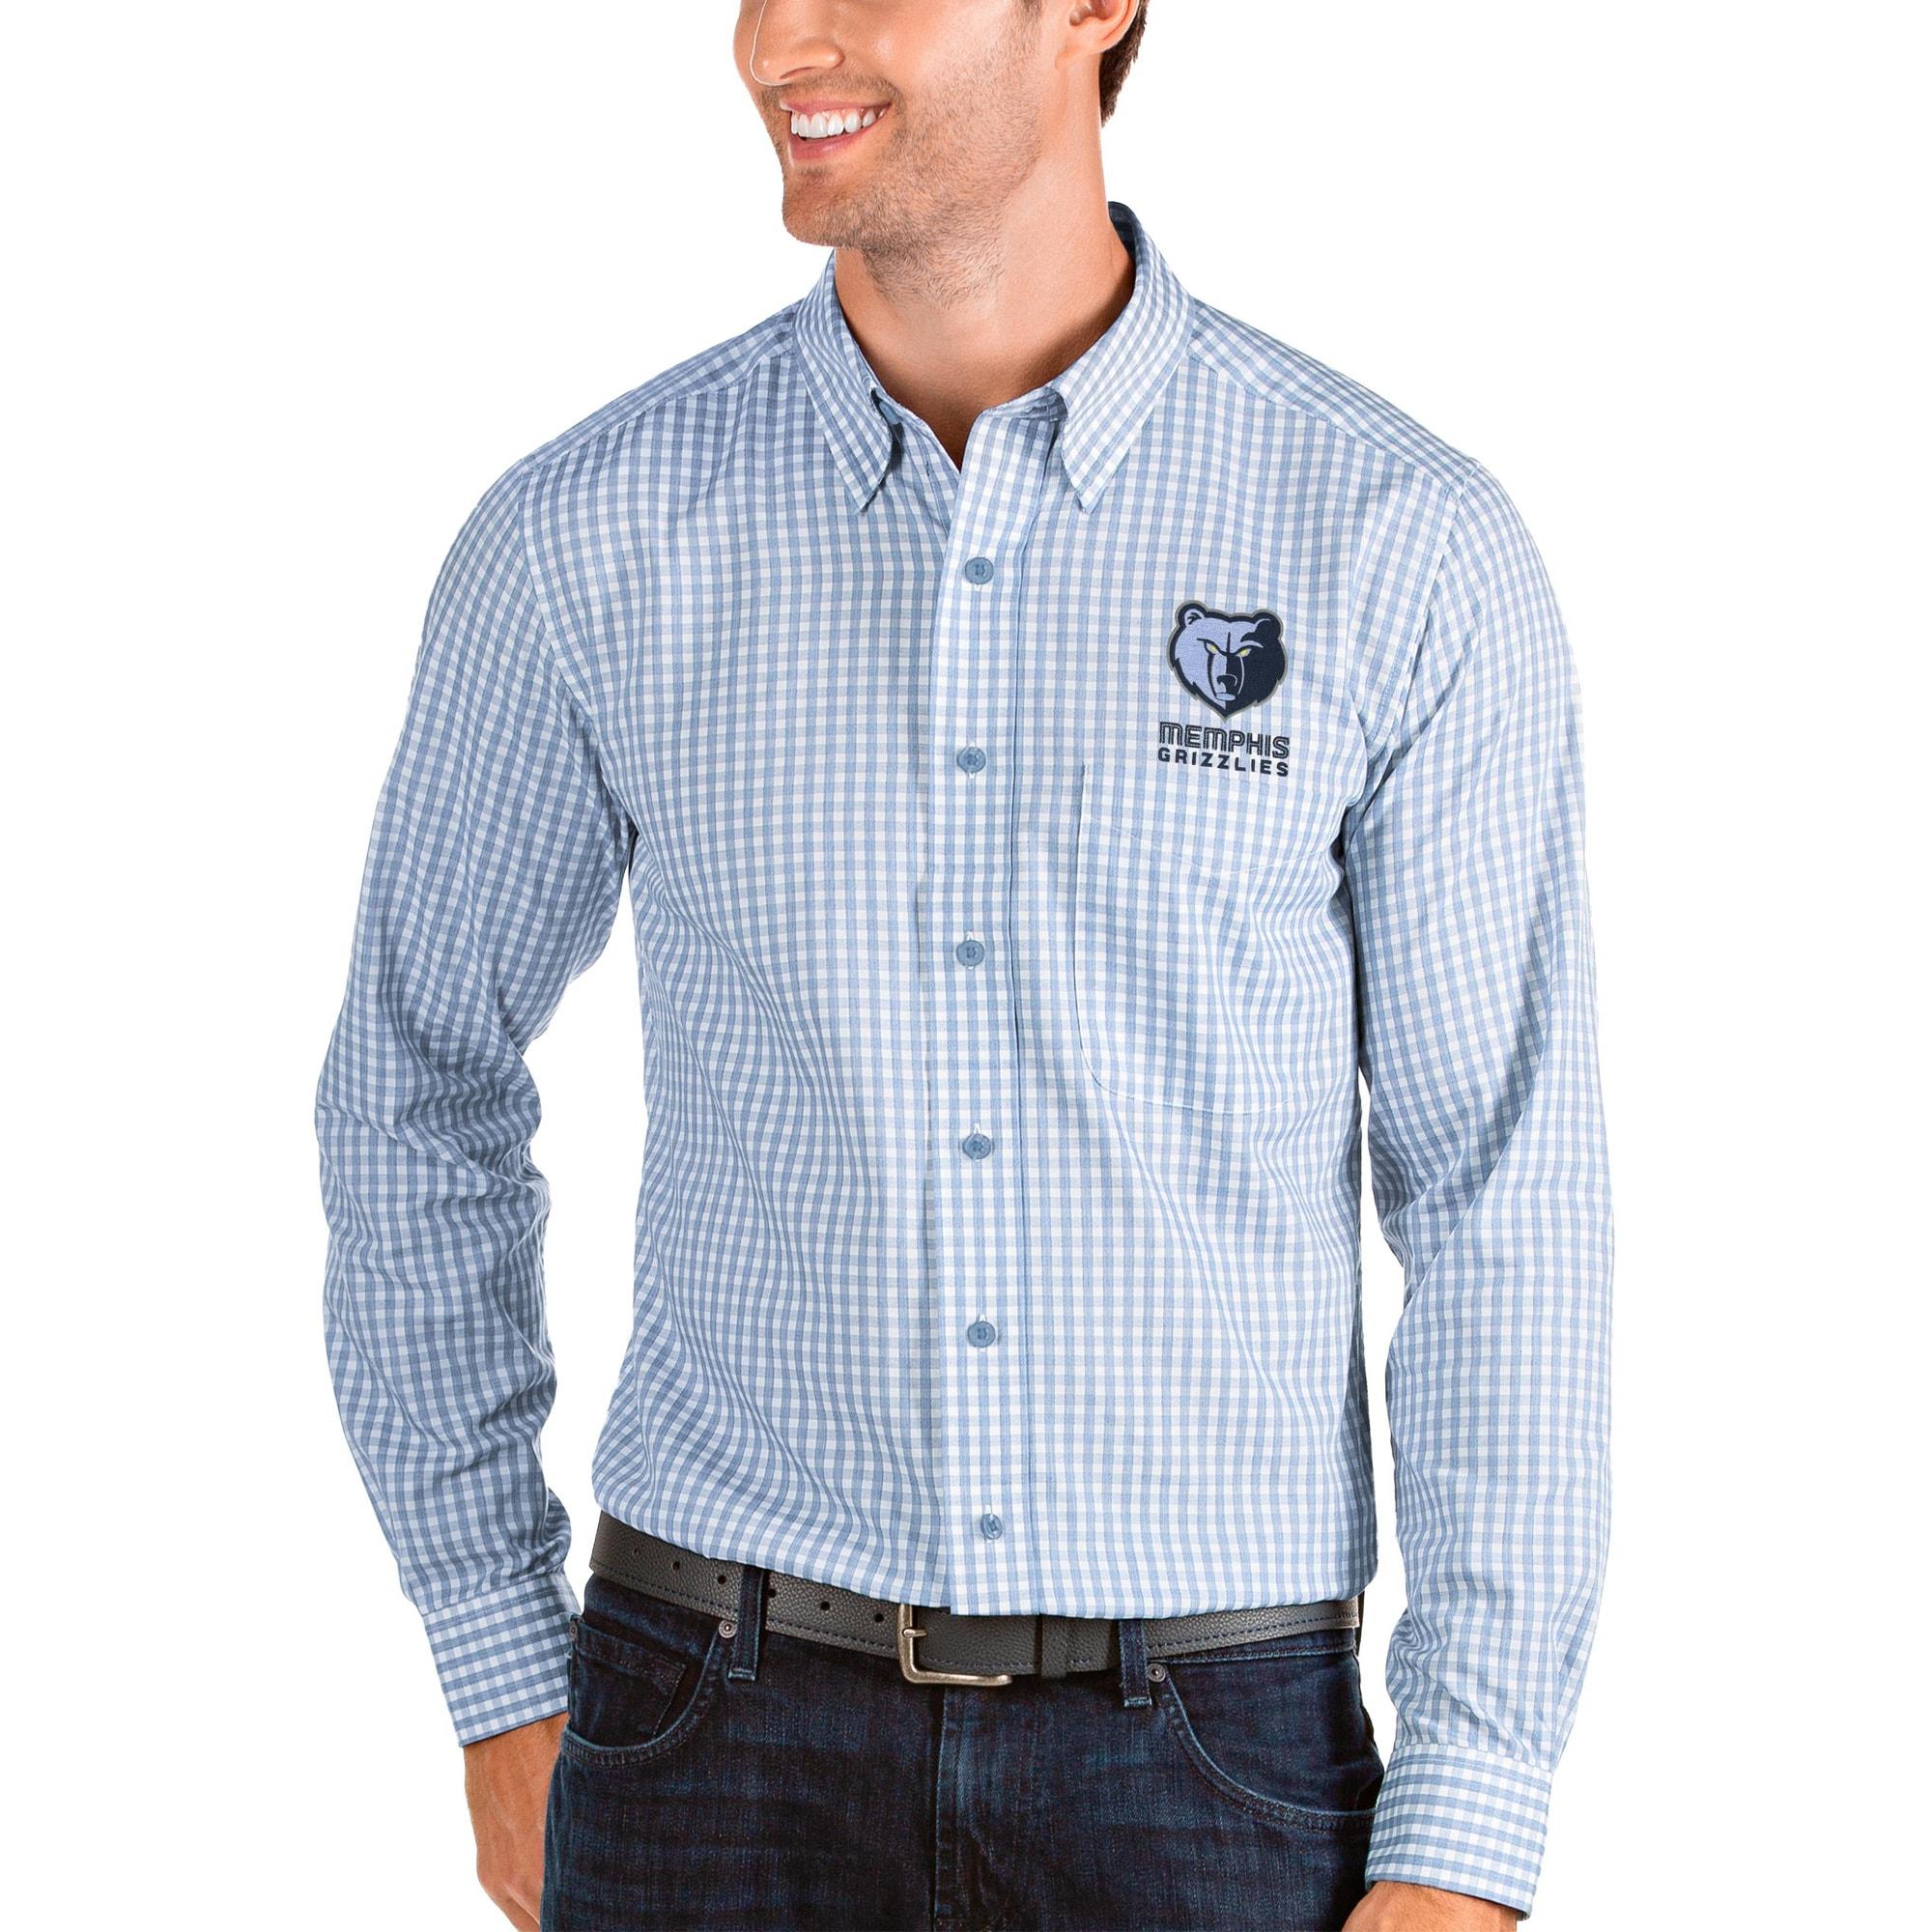 Memphis Grizzlies Antigua Structure Long Sleeve Button-Up Shirt - Blue/White